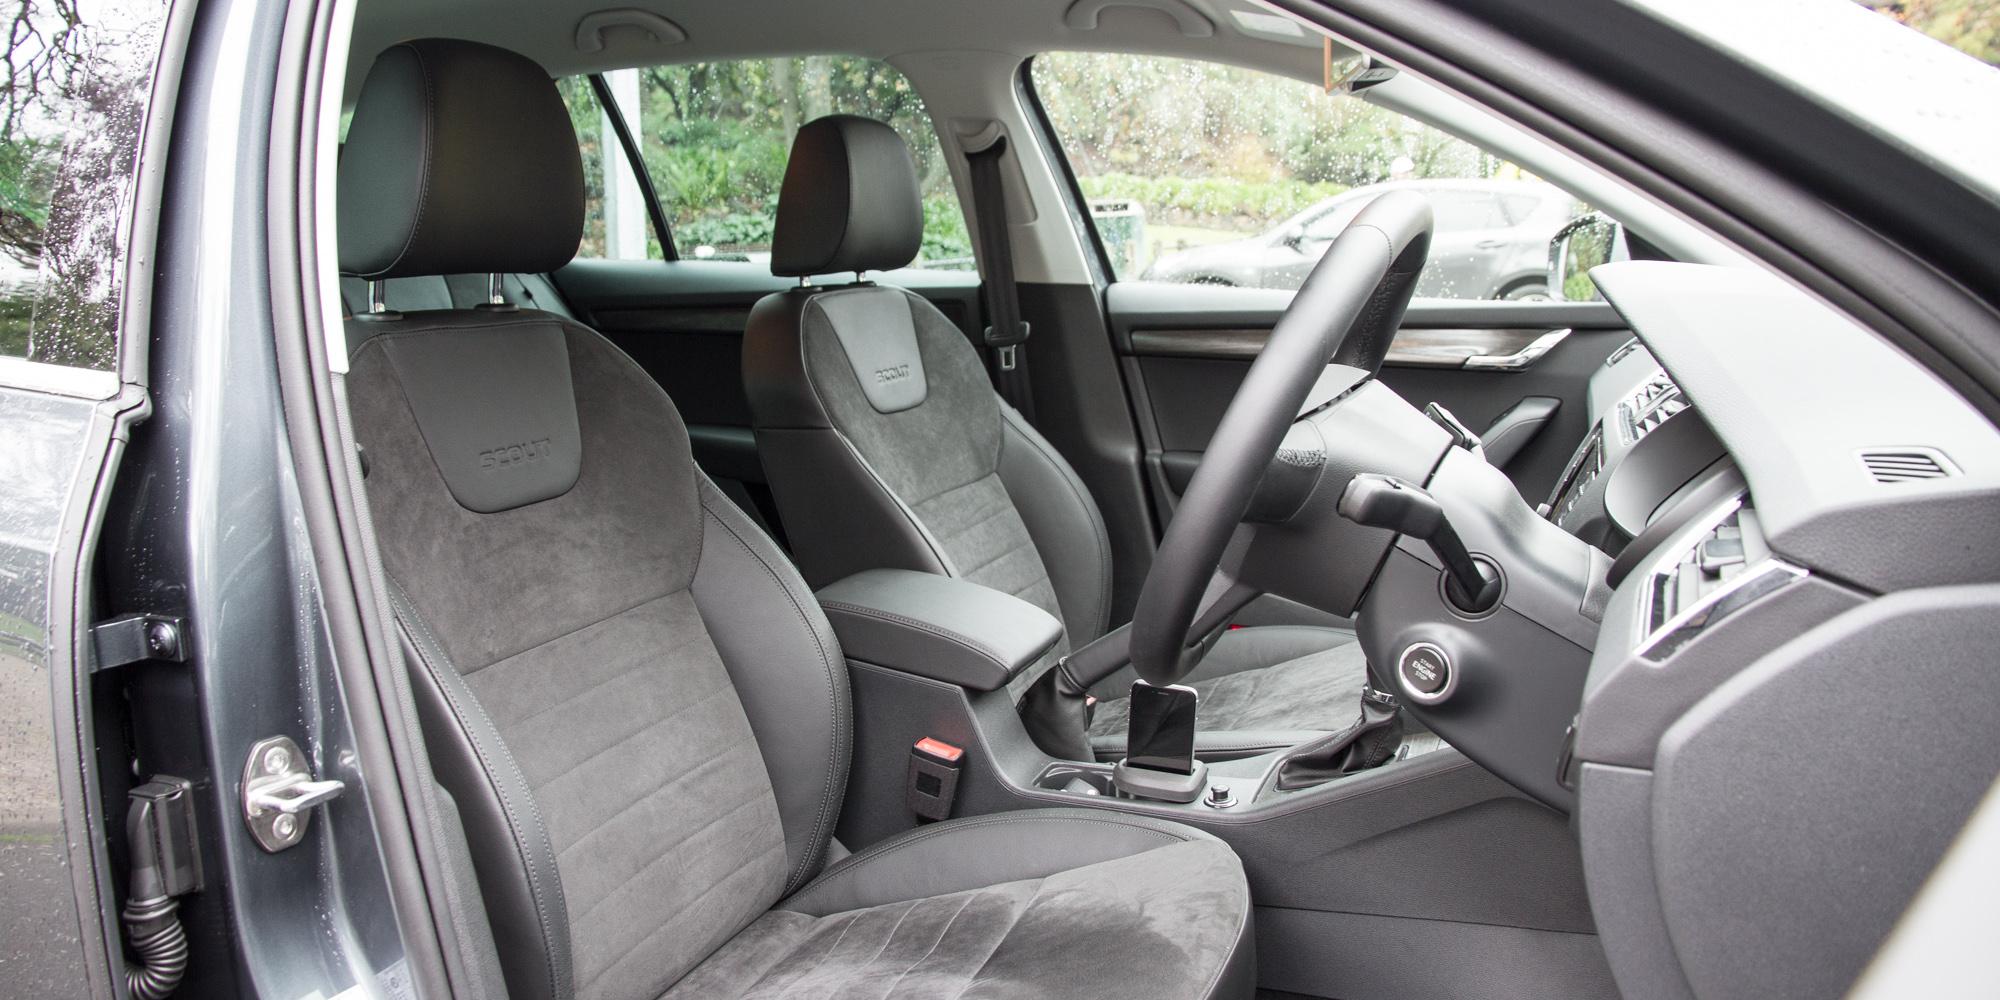 2016 Skoda Octavia Scout Interior Cockpit Seat